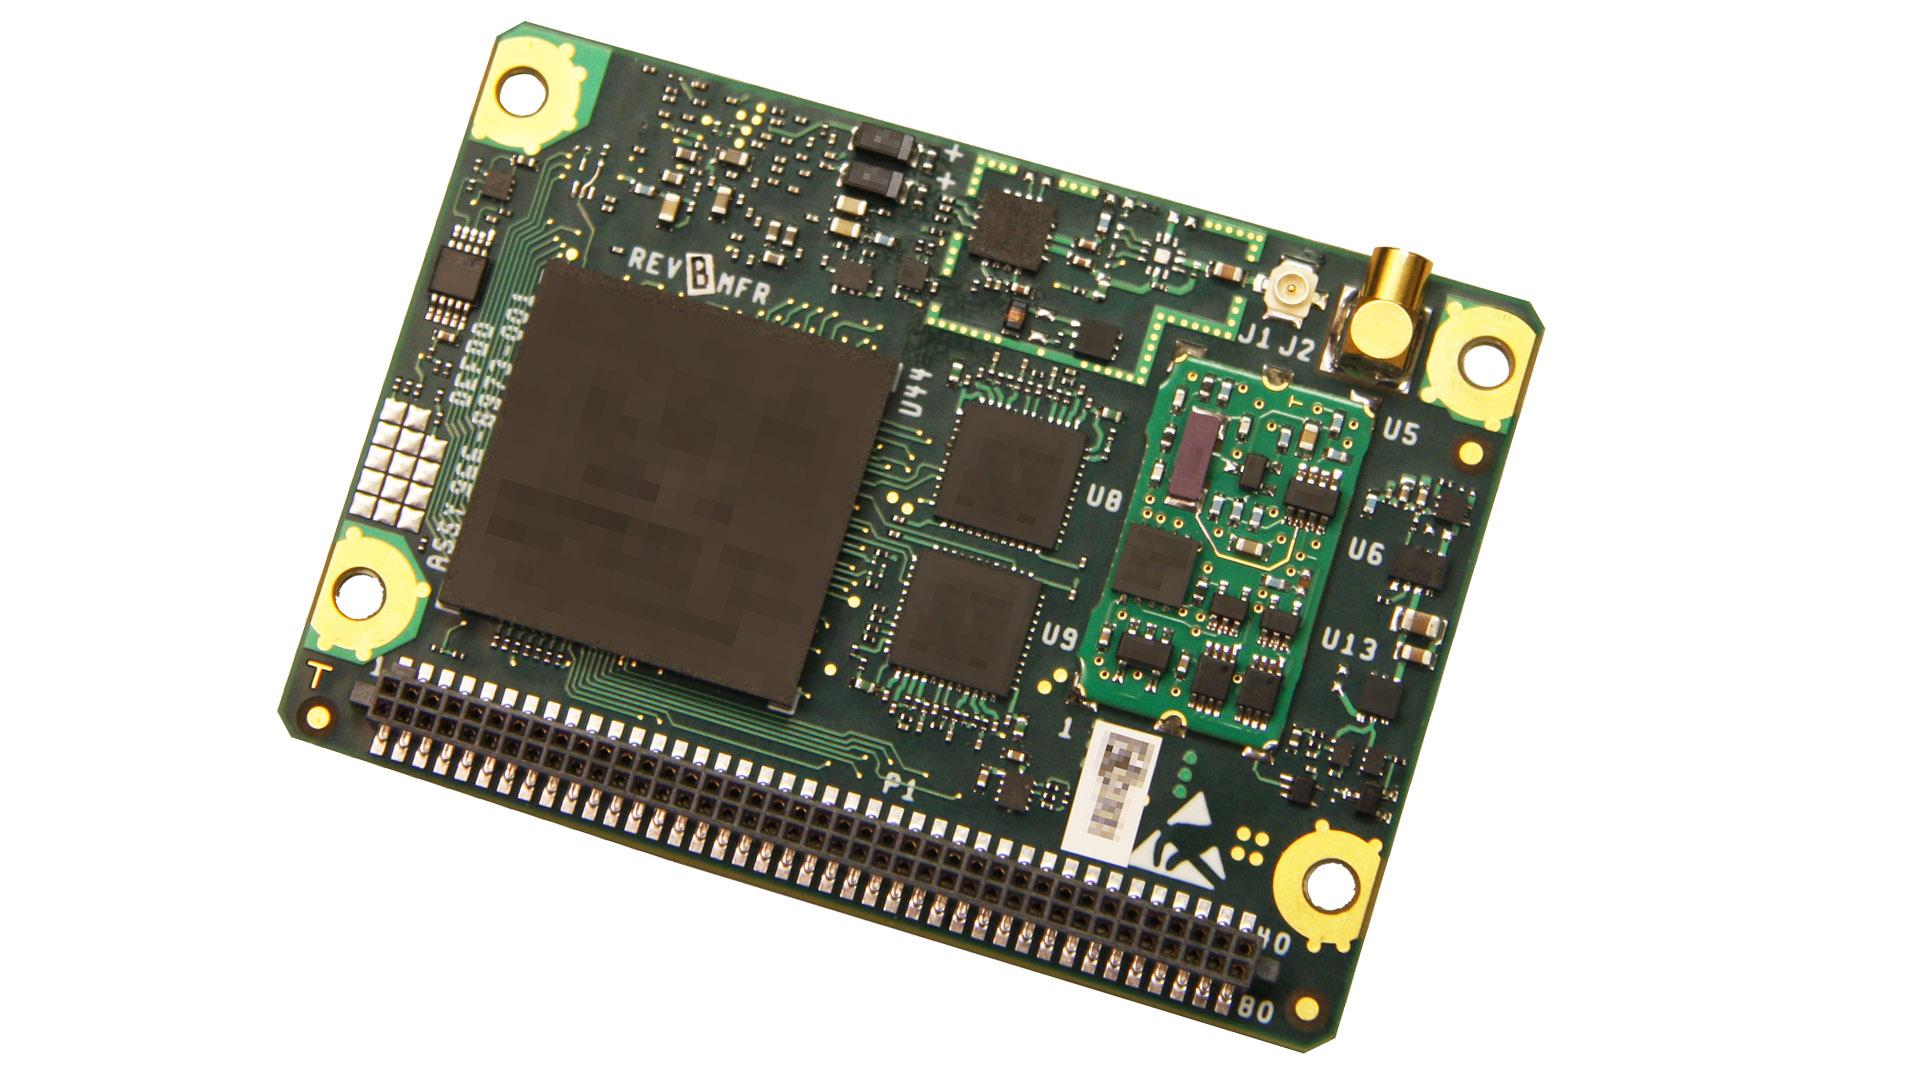 Anti jamming gps - jamming m-code gps receiver